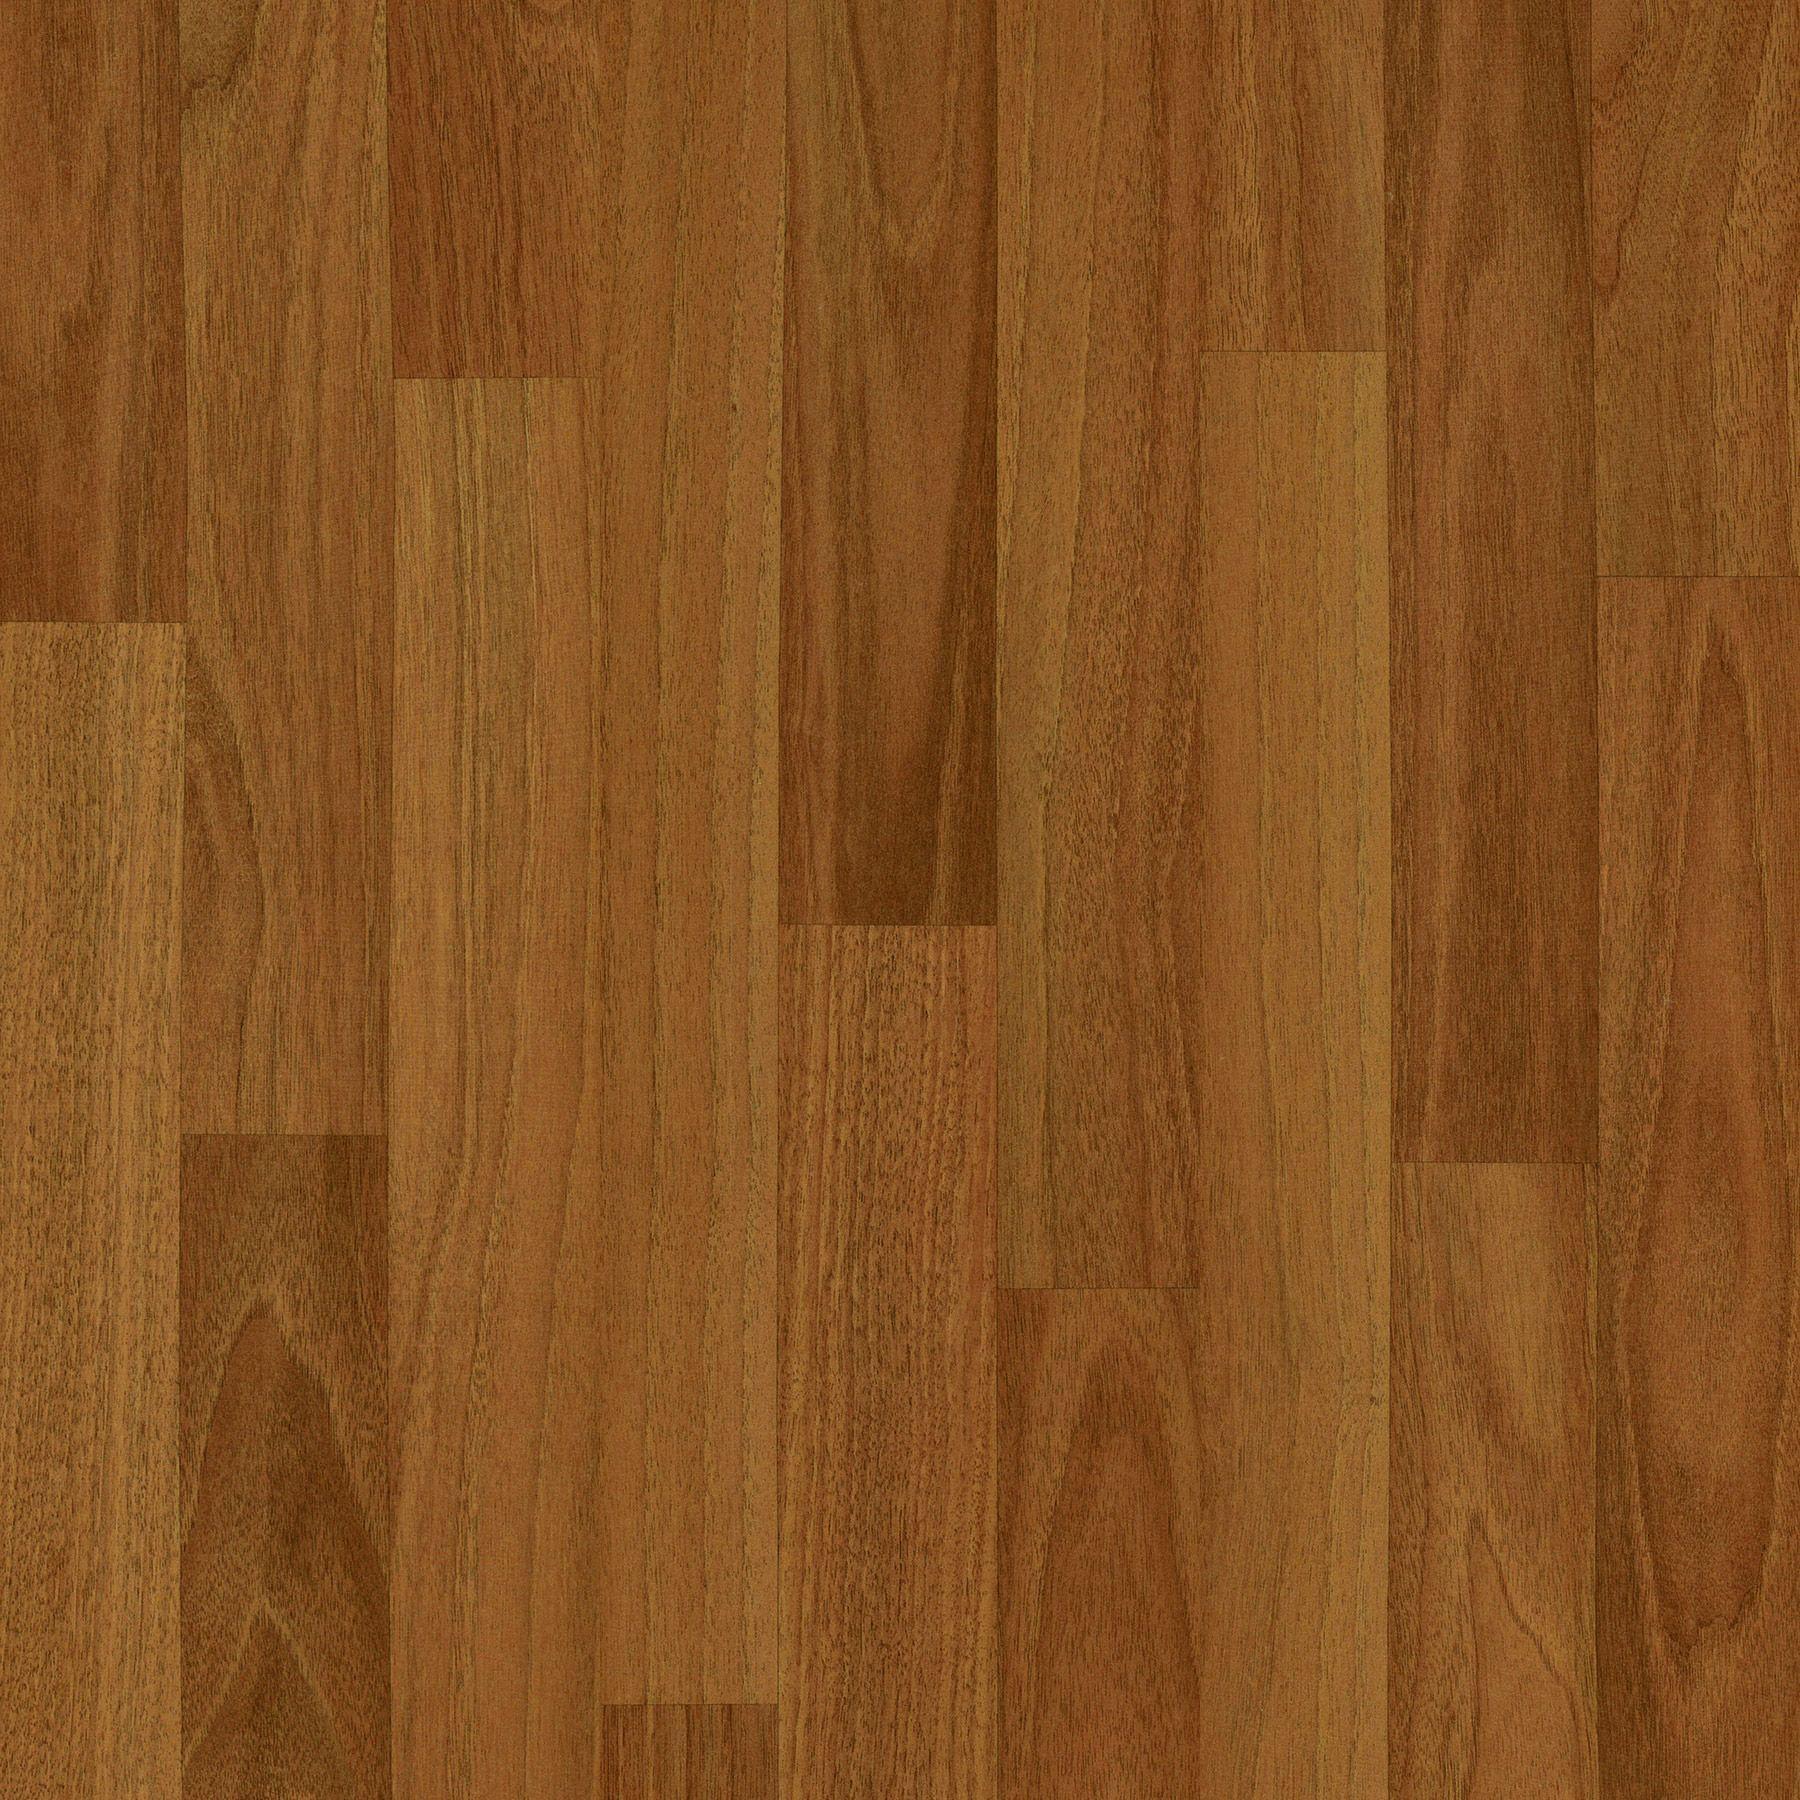 manufacturers maple crown flooring palomino triple bella cera products floors